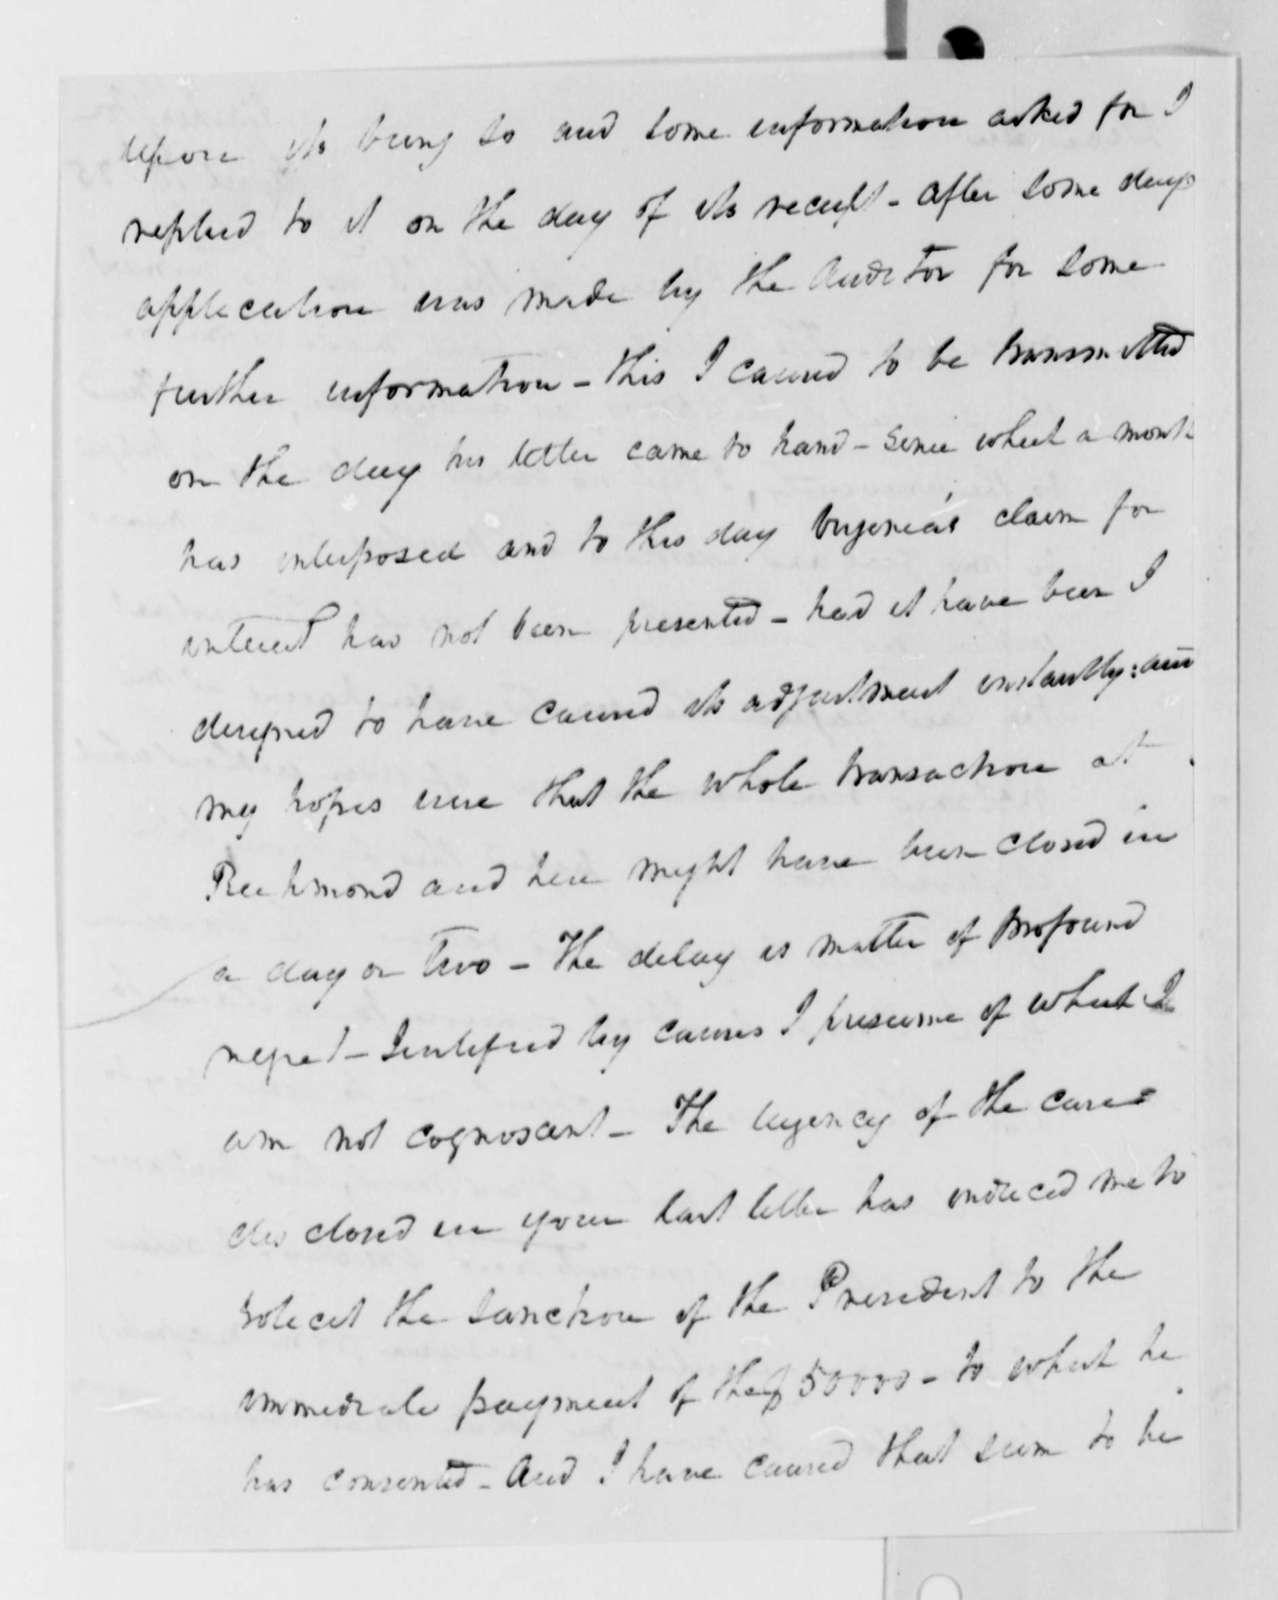 James Barbour to Thomas Jefferson, April 19, 1825